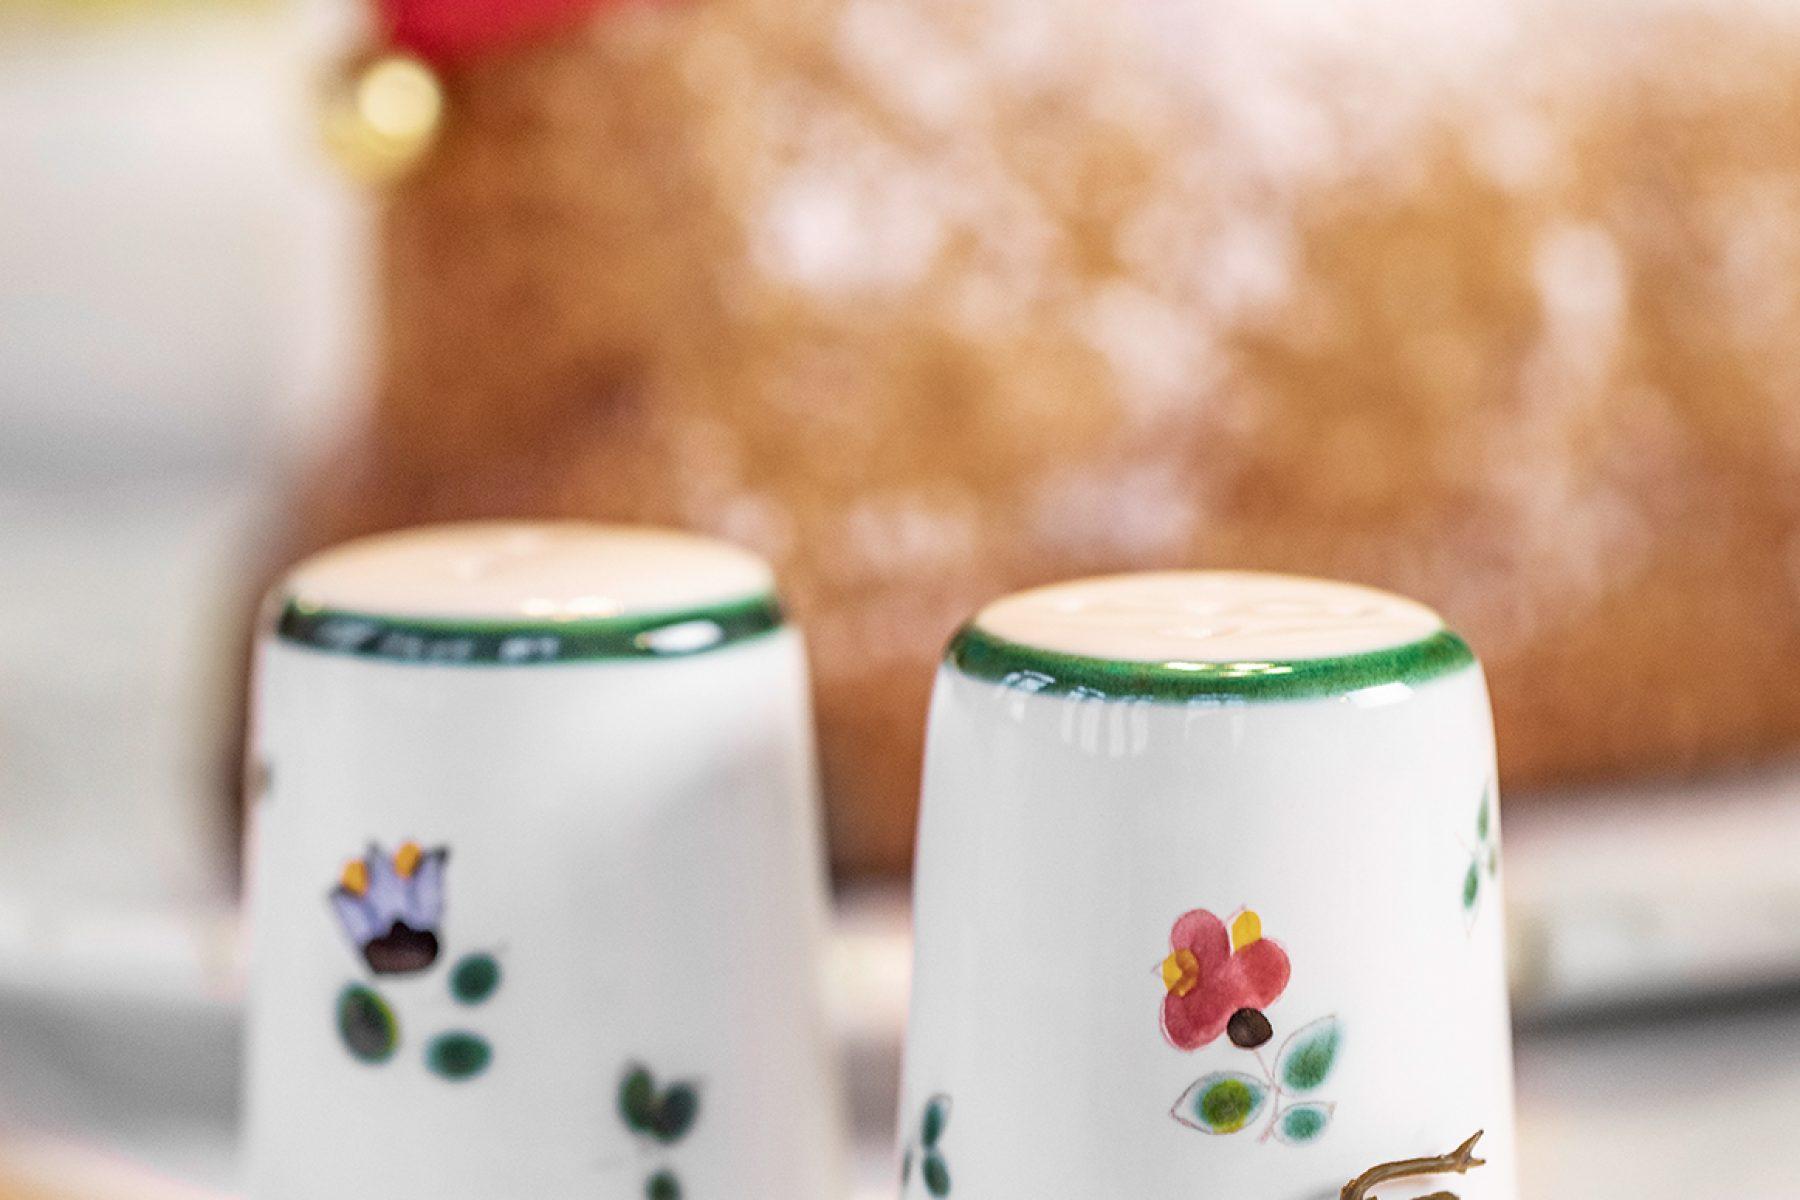 Gmundner Keramik - Streublumen